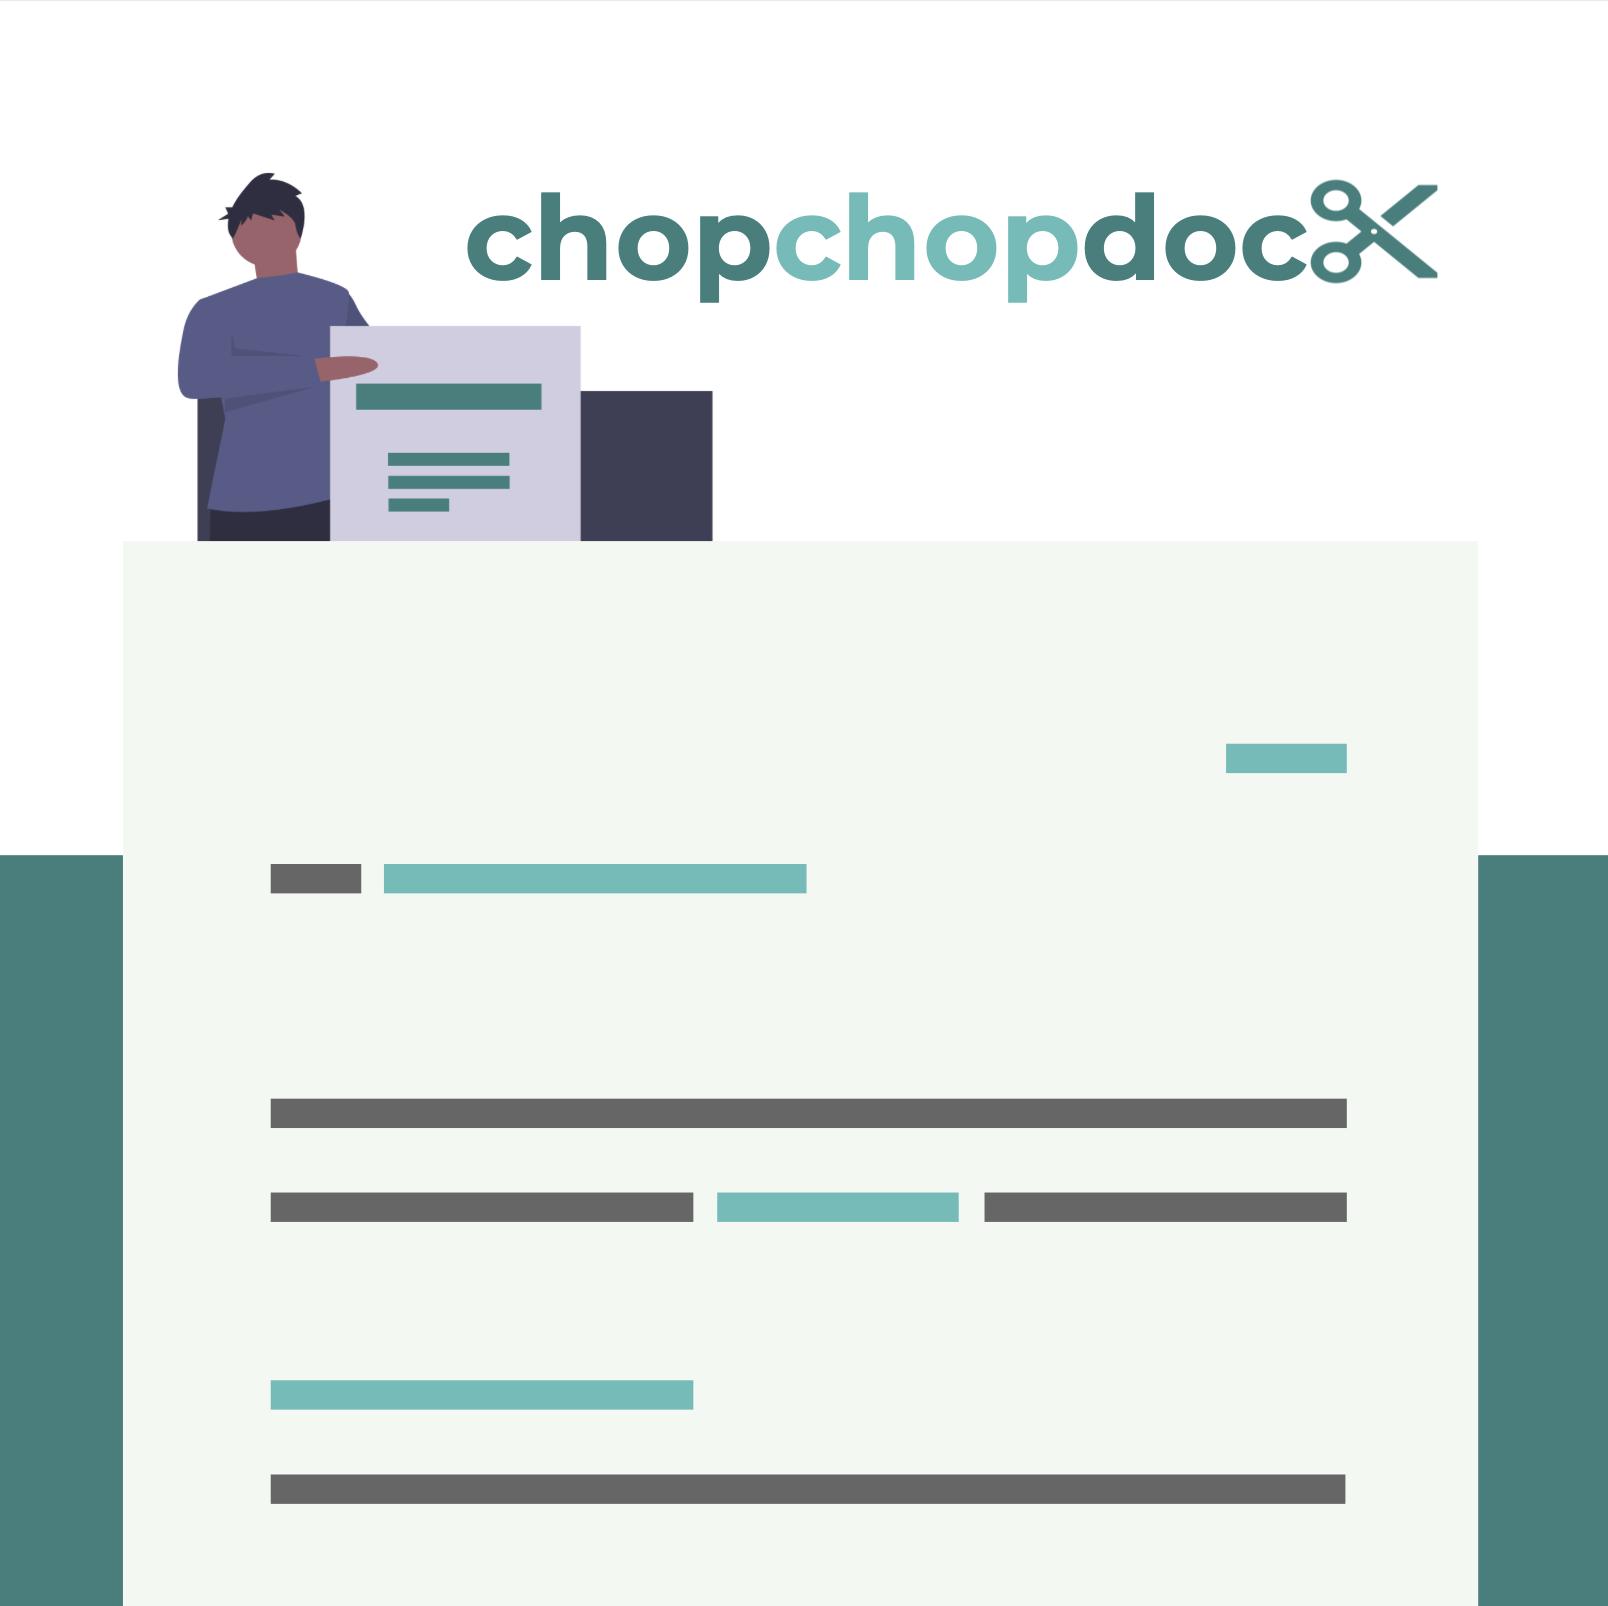 CHOPCHOPDOC